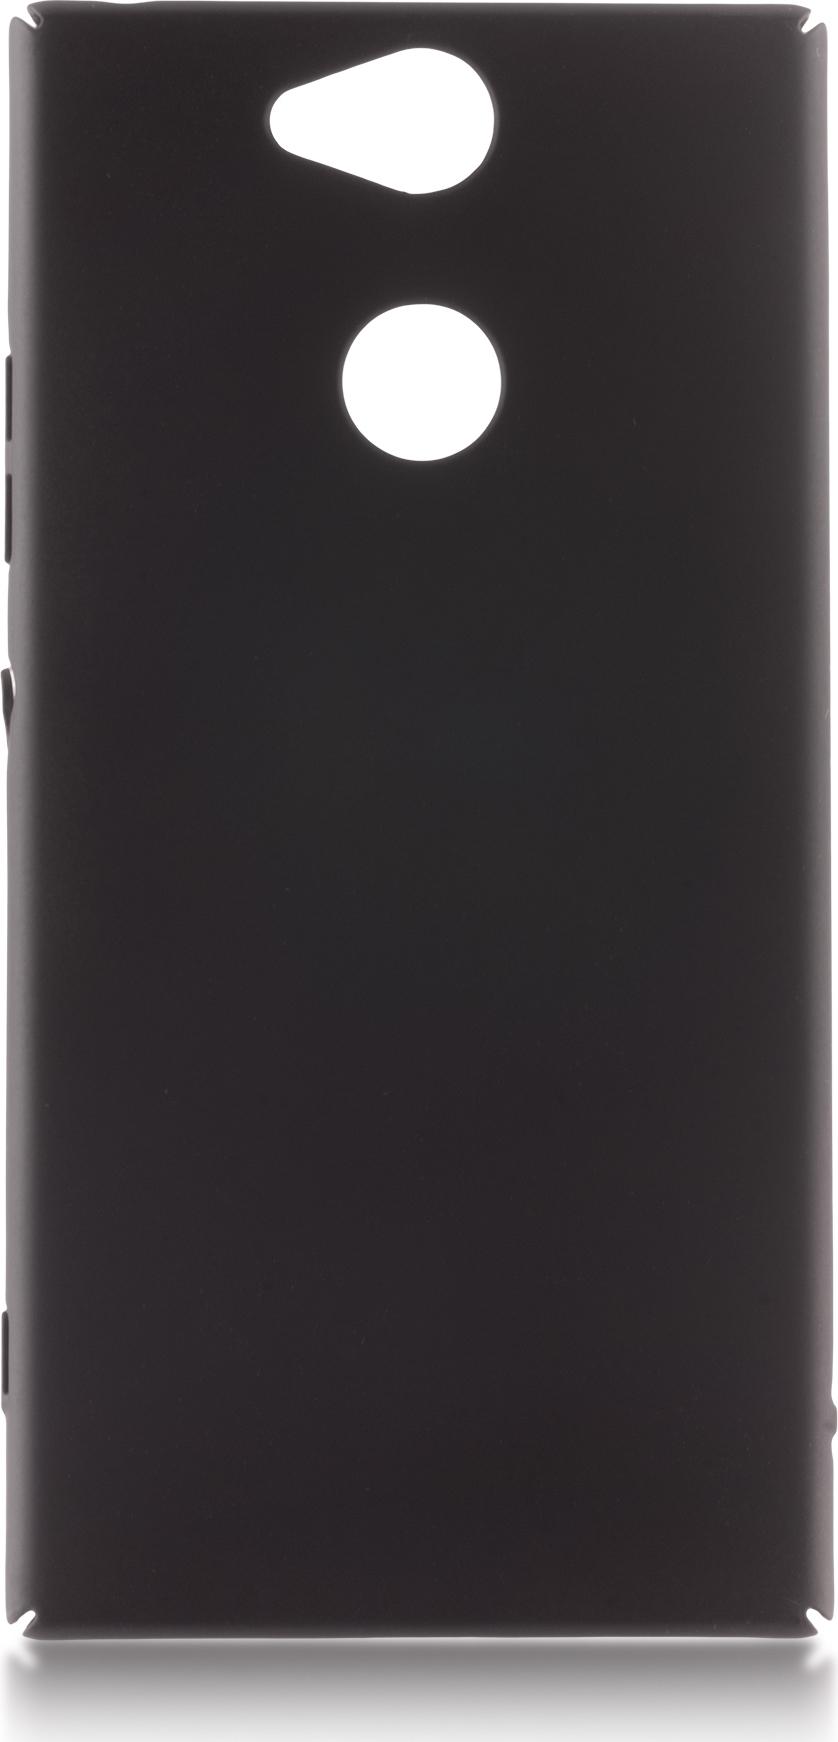 Чехол Brosco 4Side Soft-Touch для Sony Xperia XA2, черный чехол для sony i4213 xperia 10 plus brosco силиконовая накладка черный